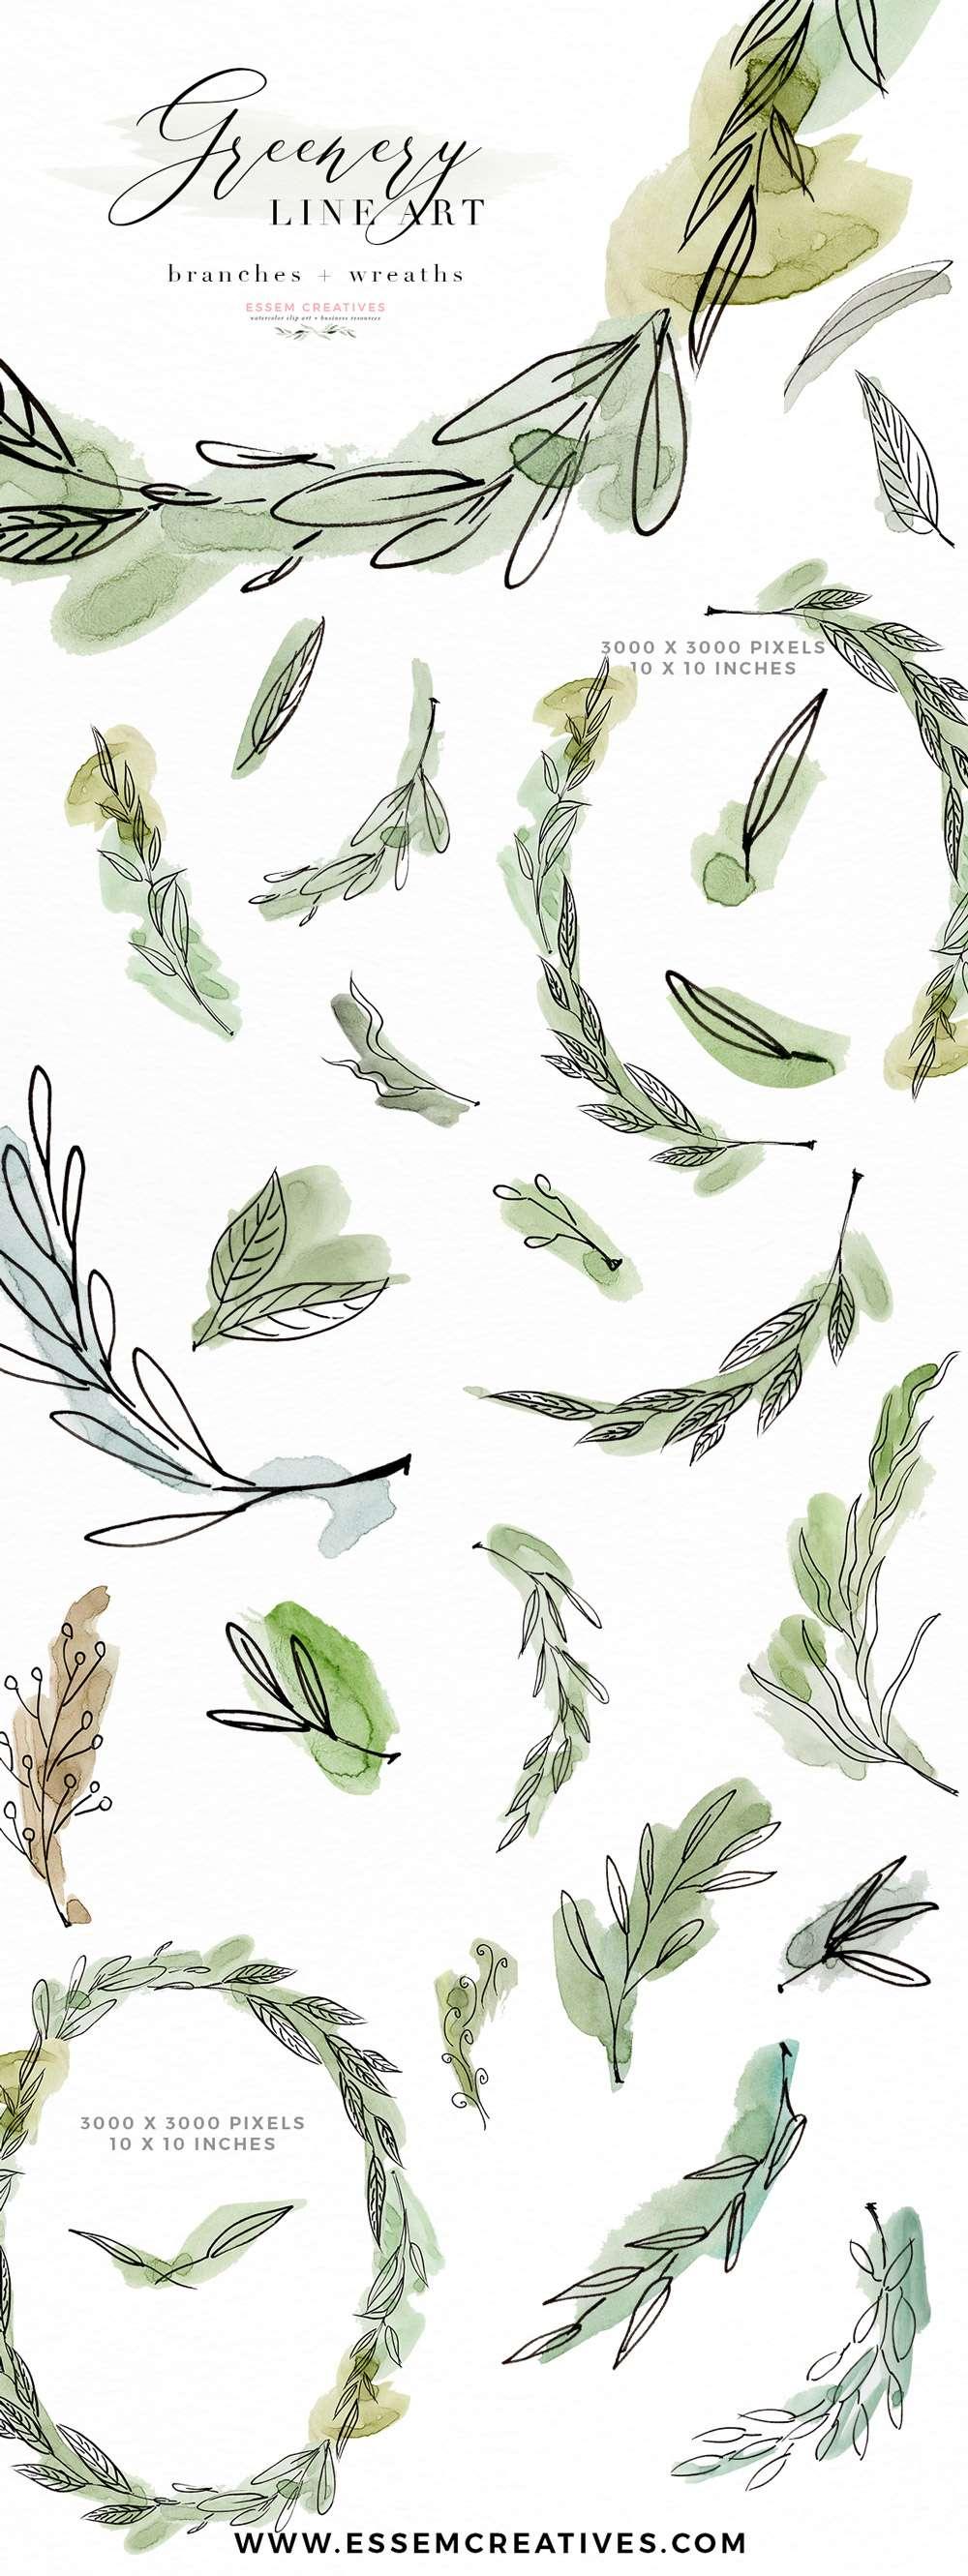 Line Art Watercolor : Greenery line art watercolor clipart olive eucalyptus